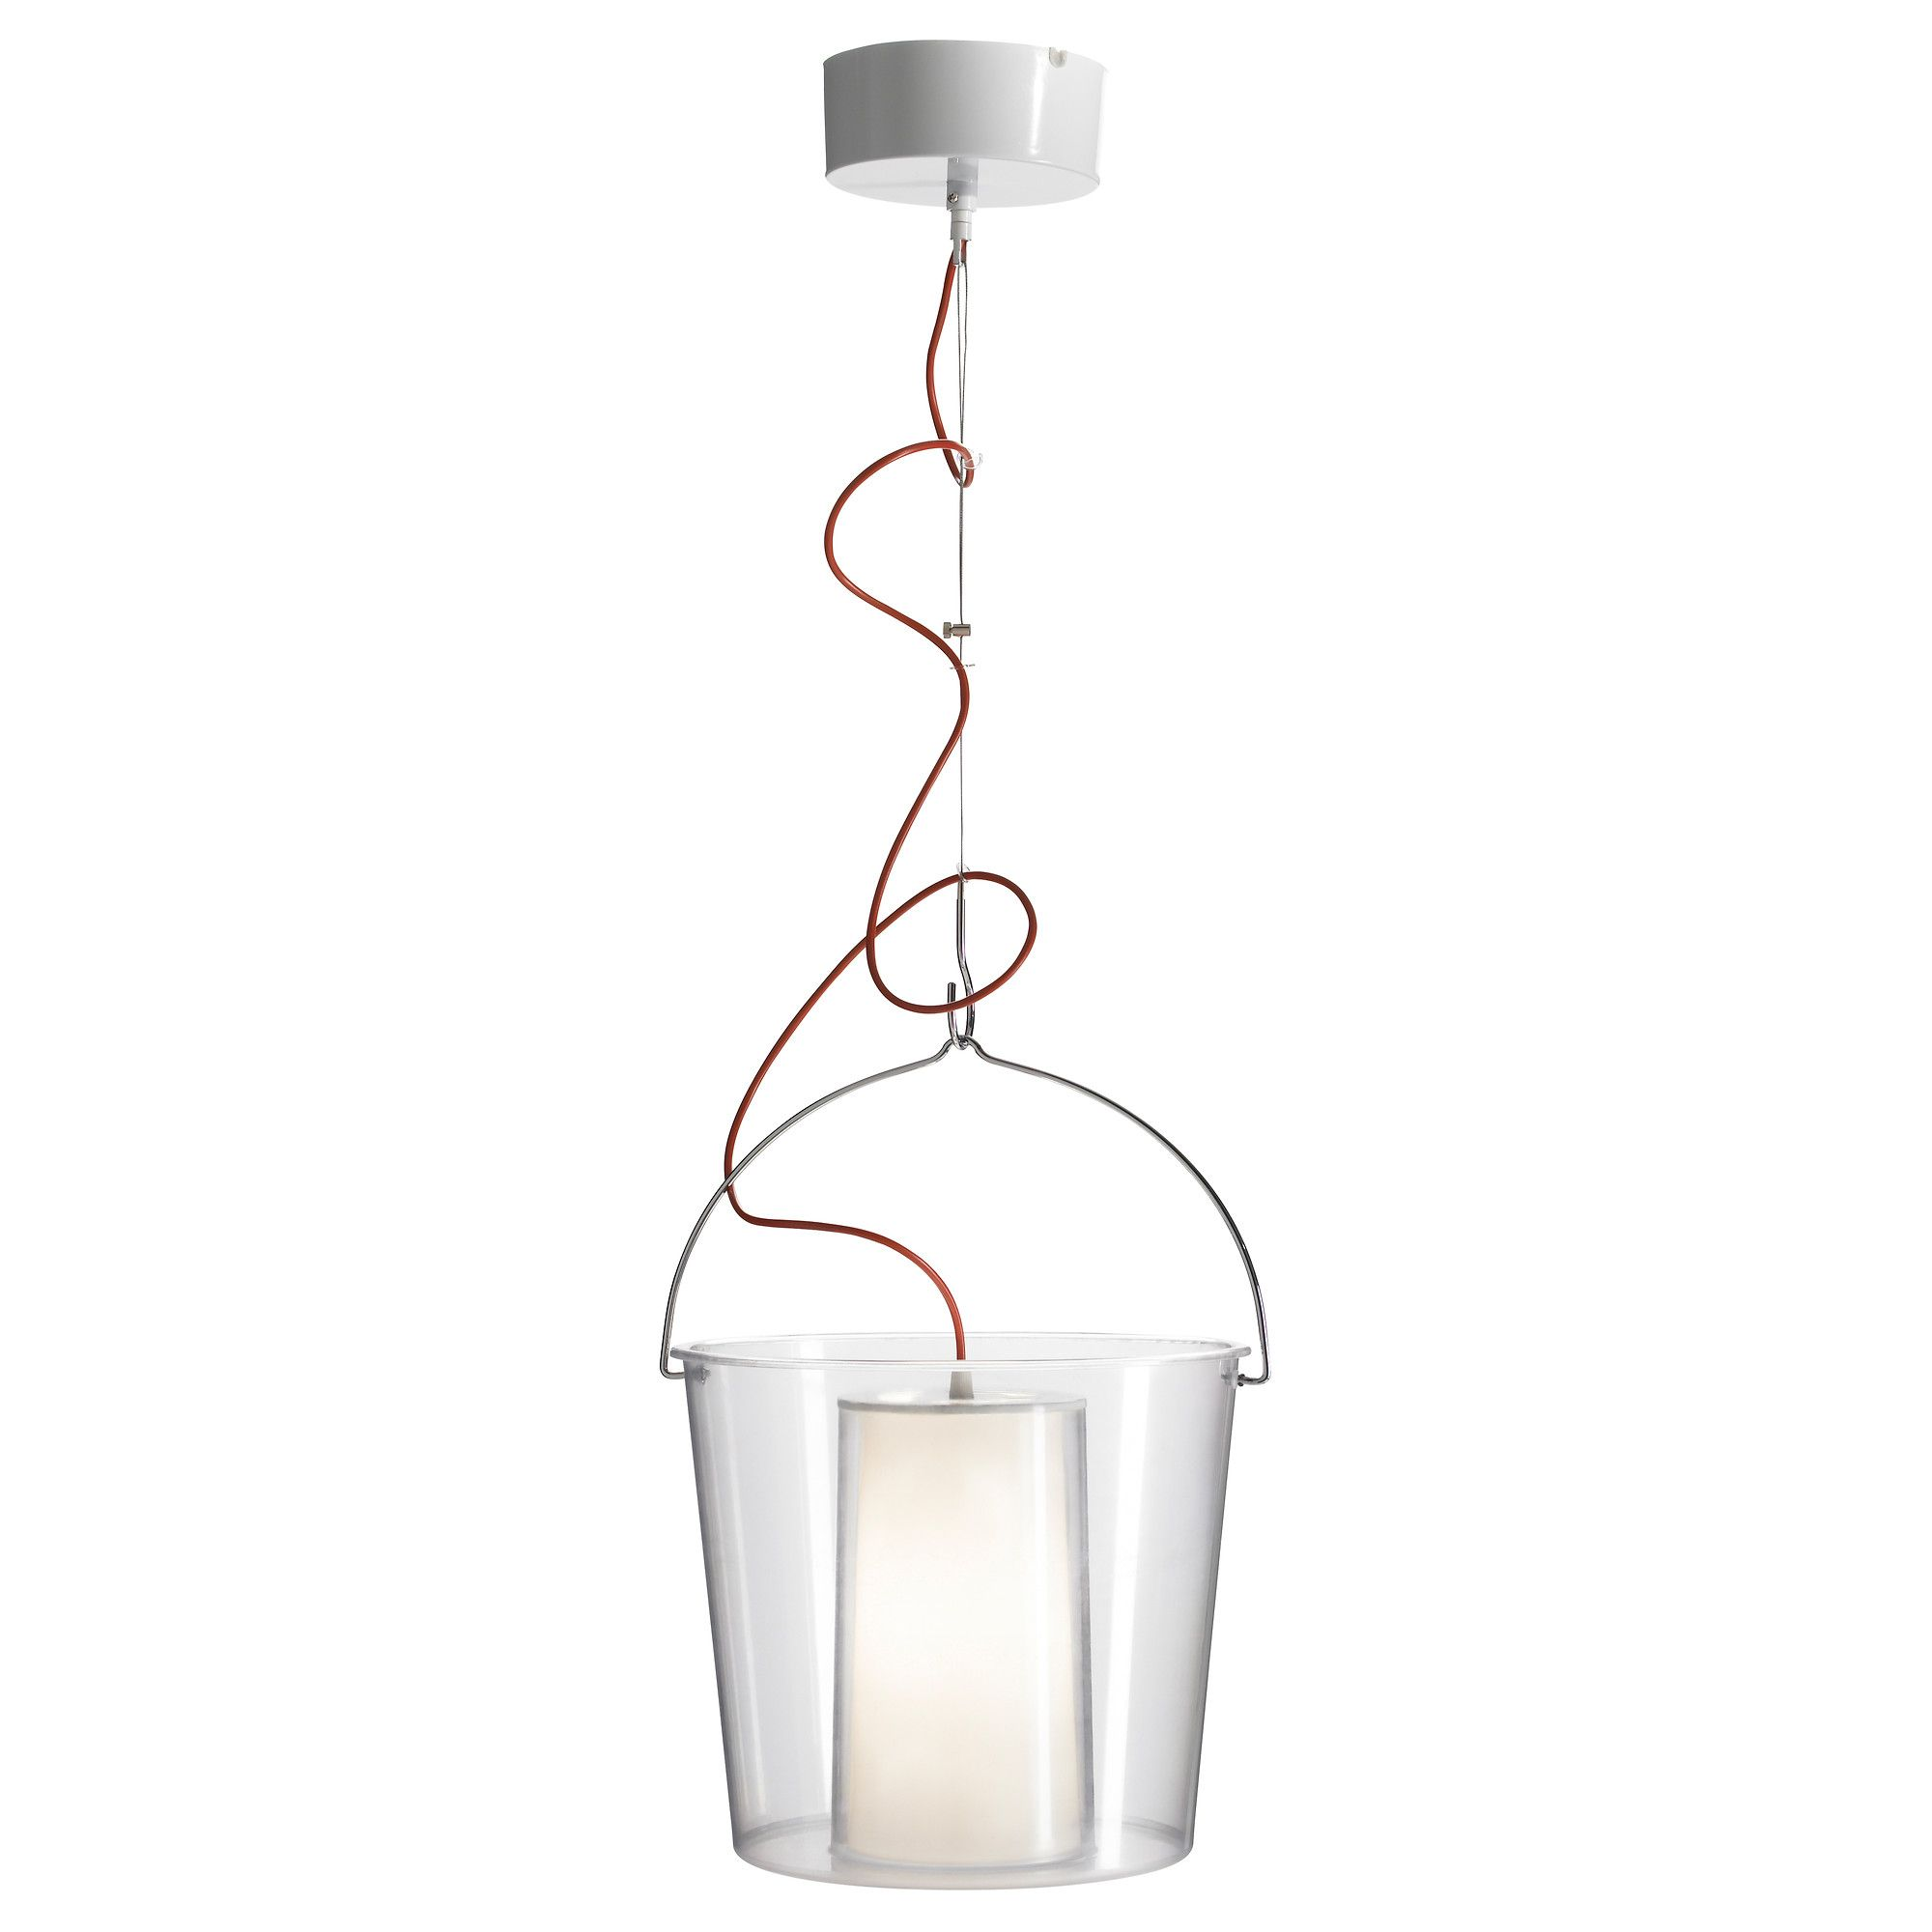 Furniture And Home Furnishings Lampade Luci